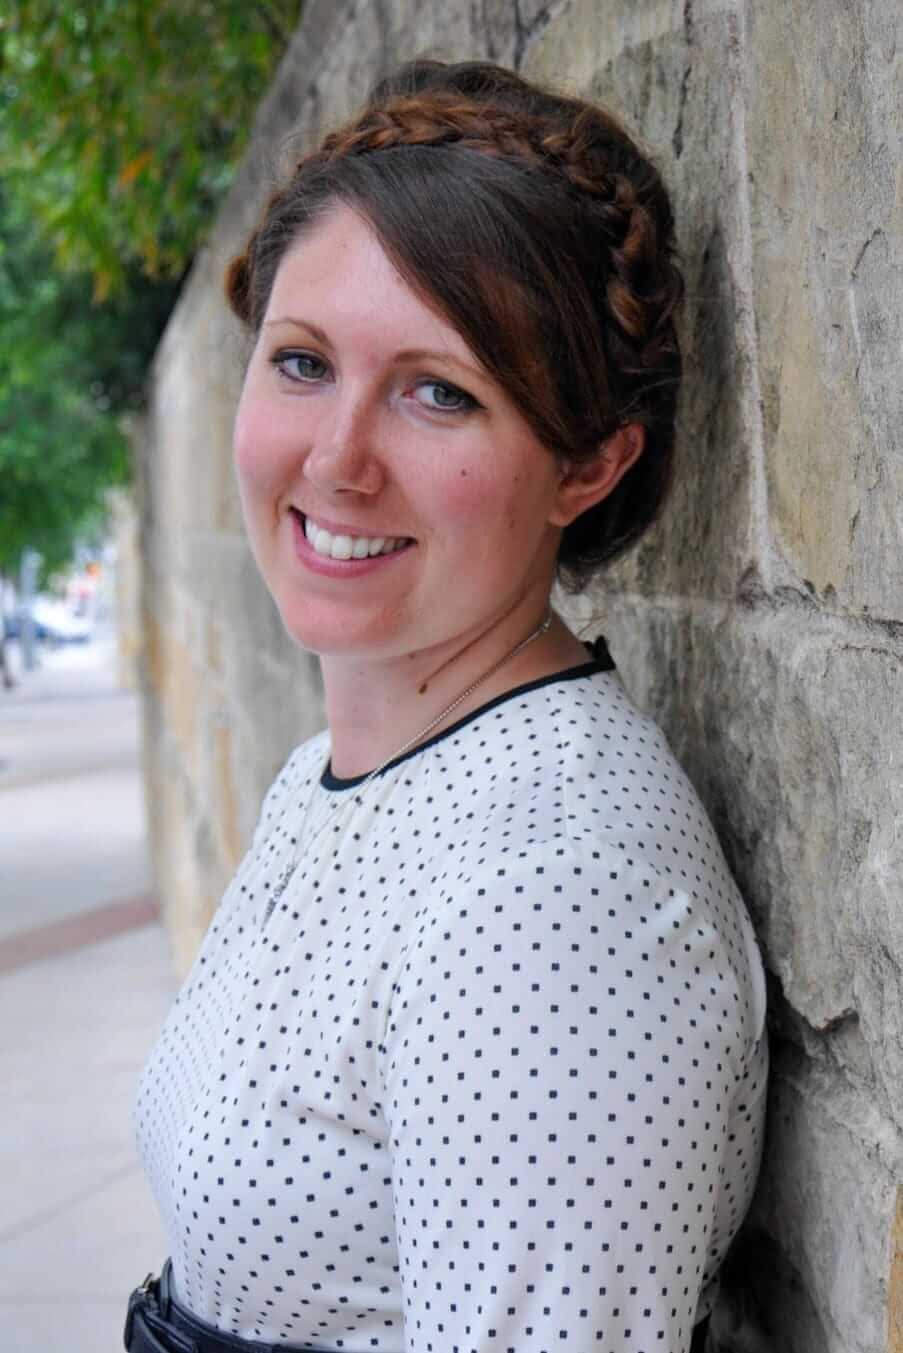 Kat Nielsen